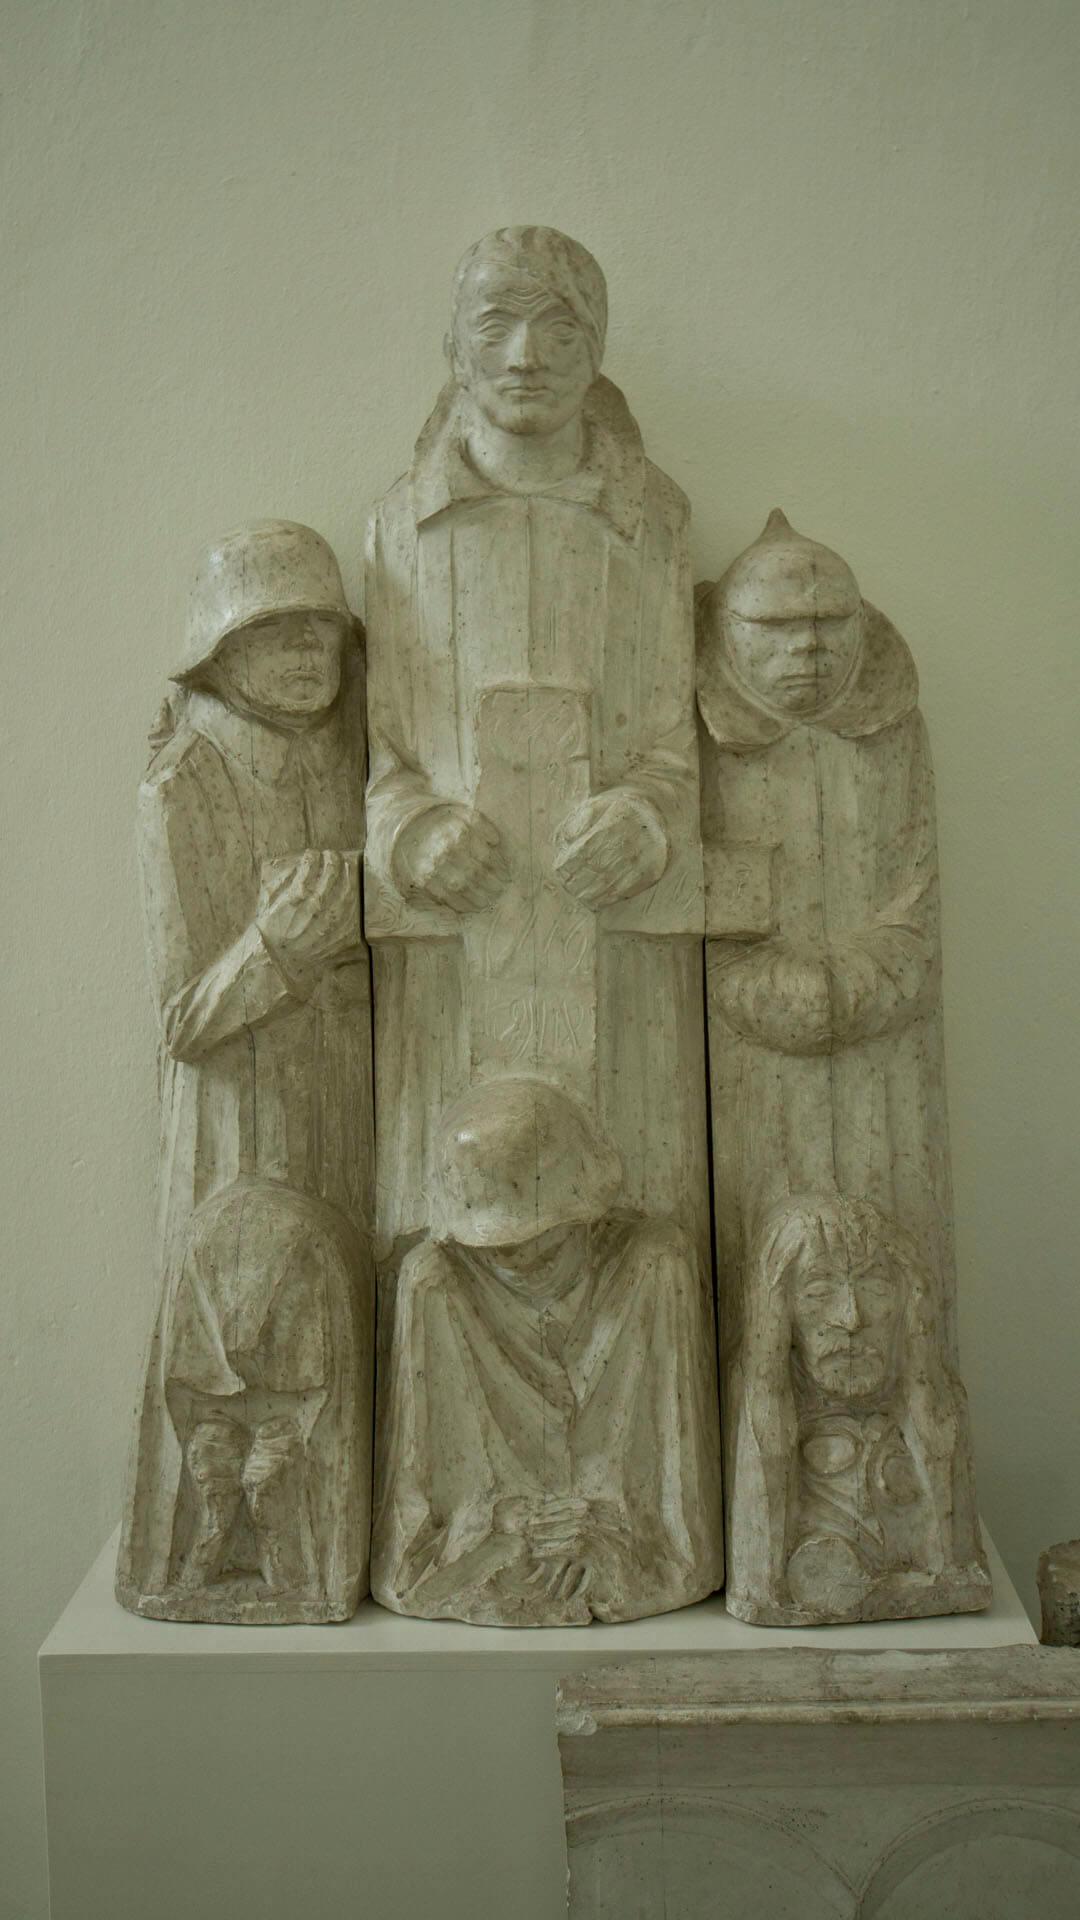 Barlachs Ehrenmal für den Magdeburger Dom